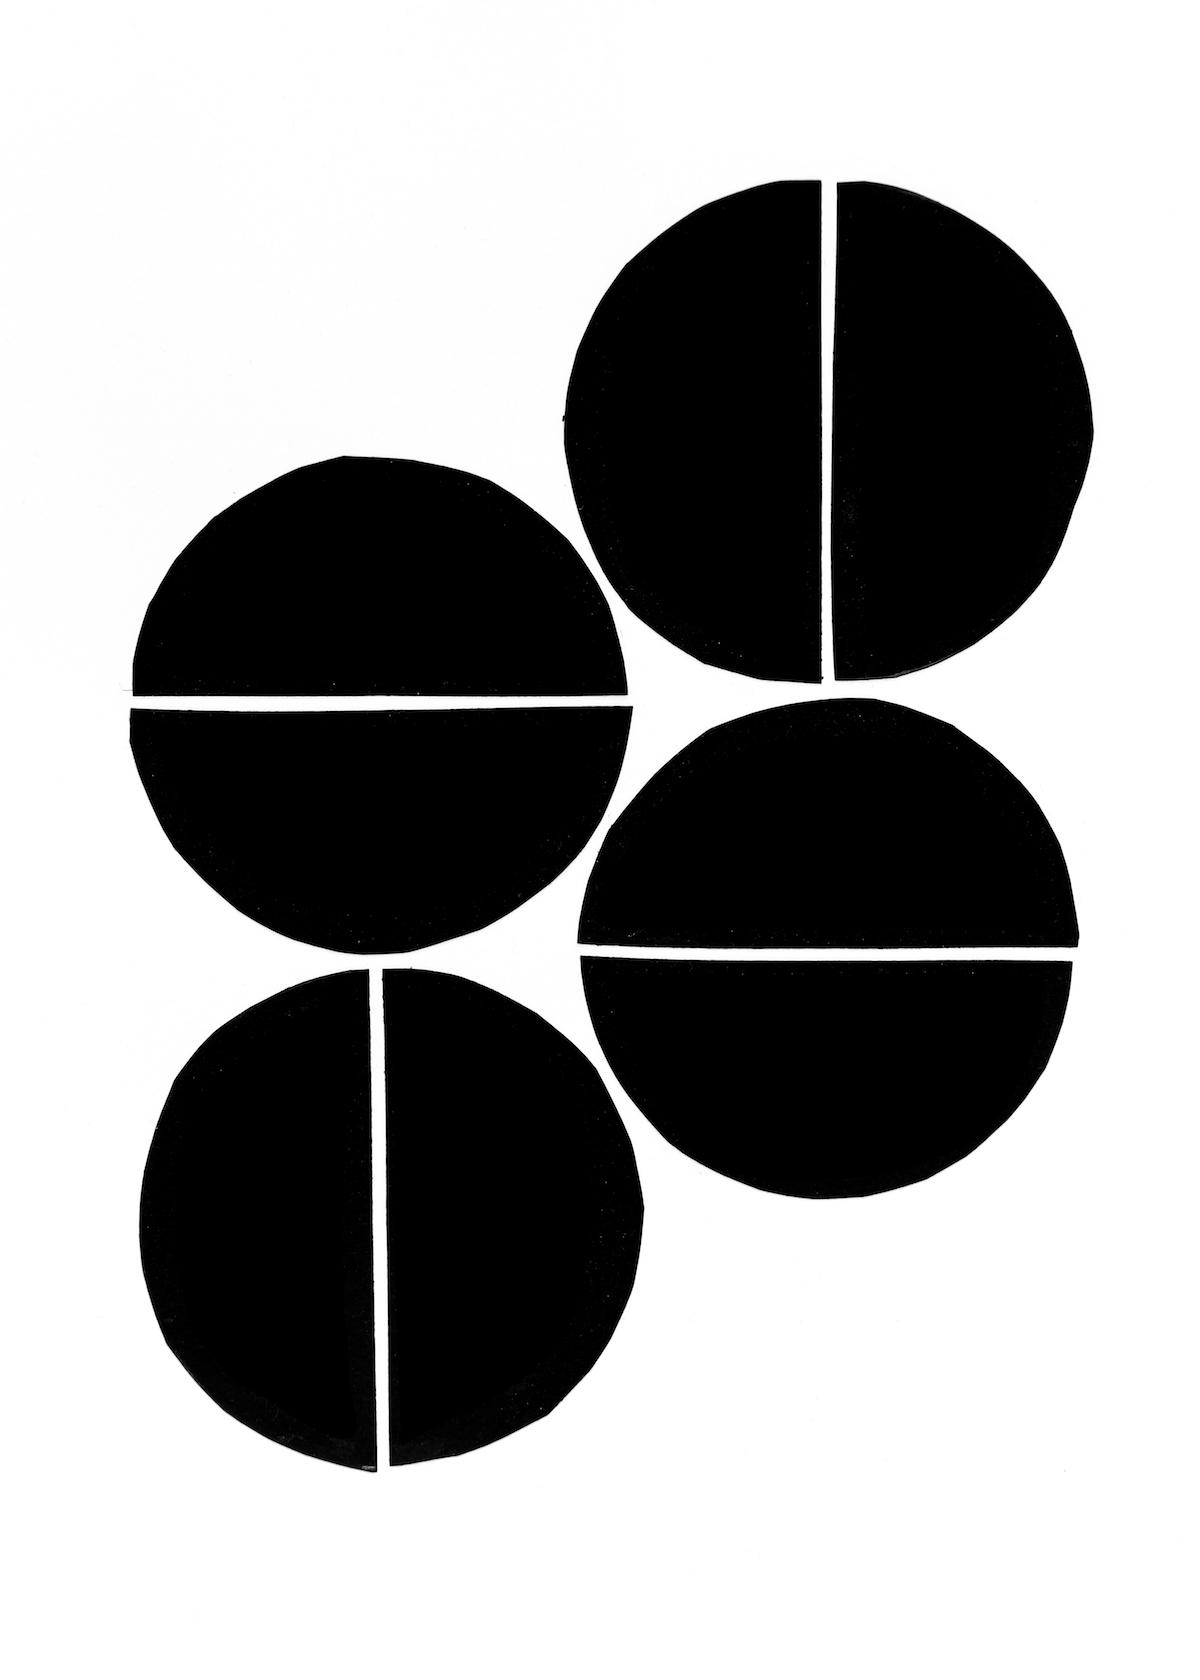 modern minimalism collage series, no. 1